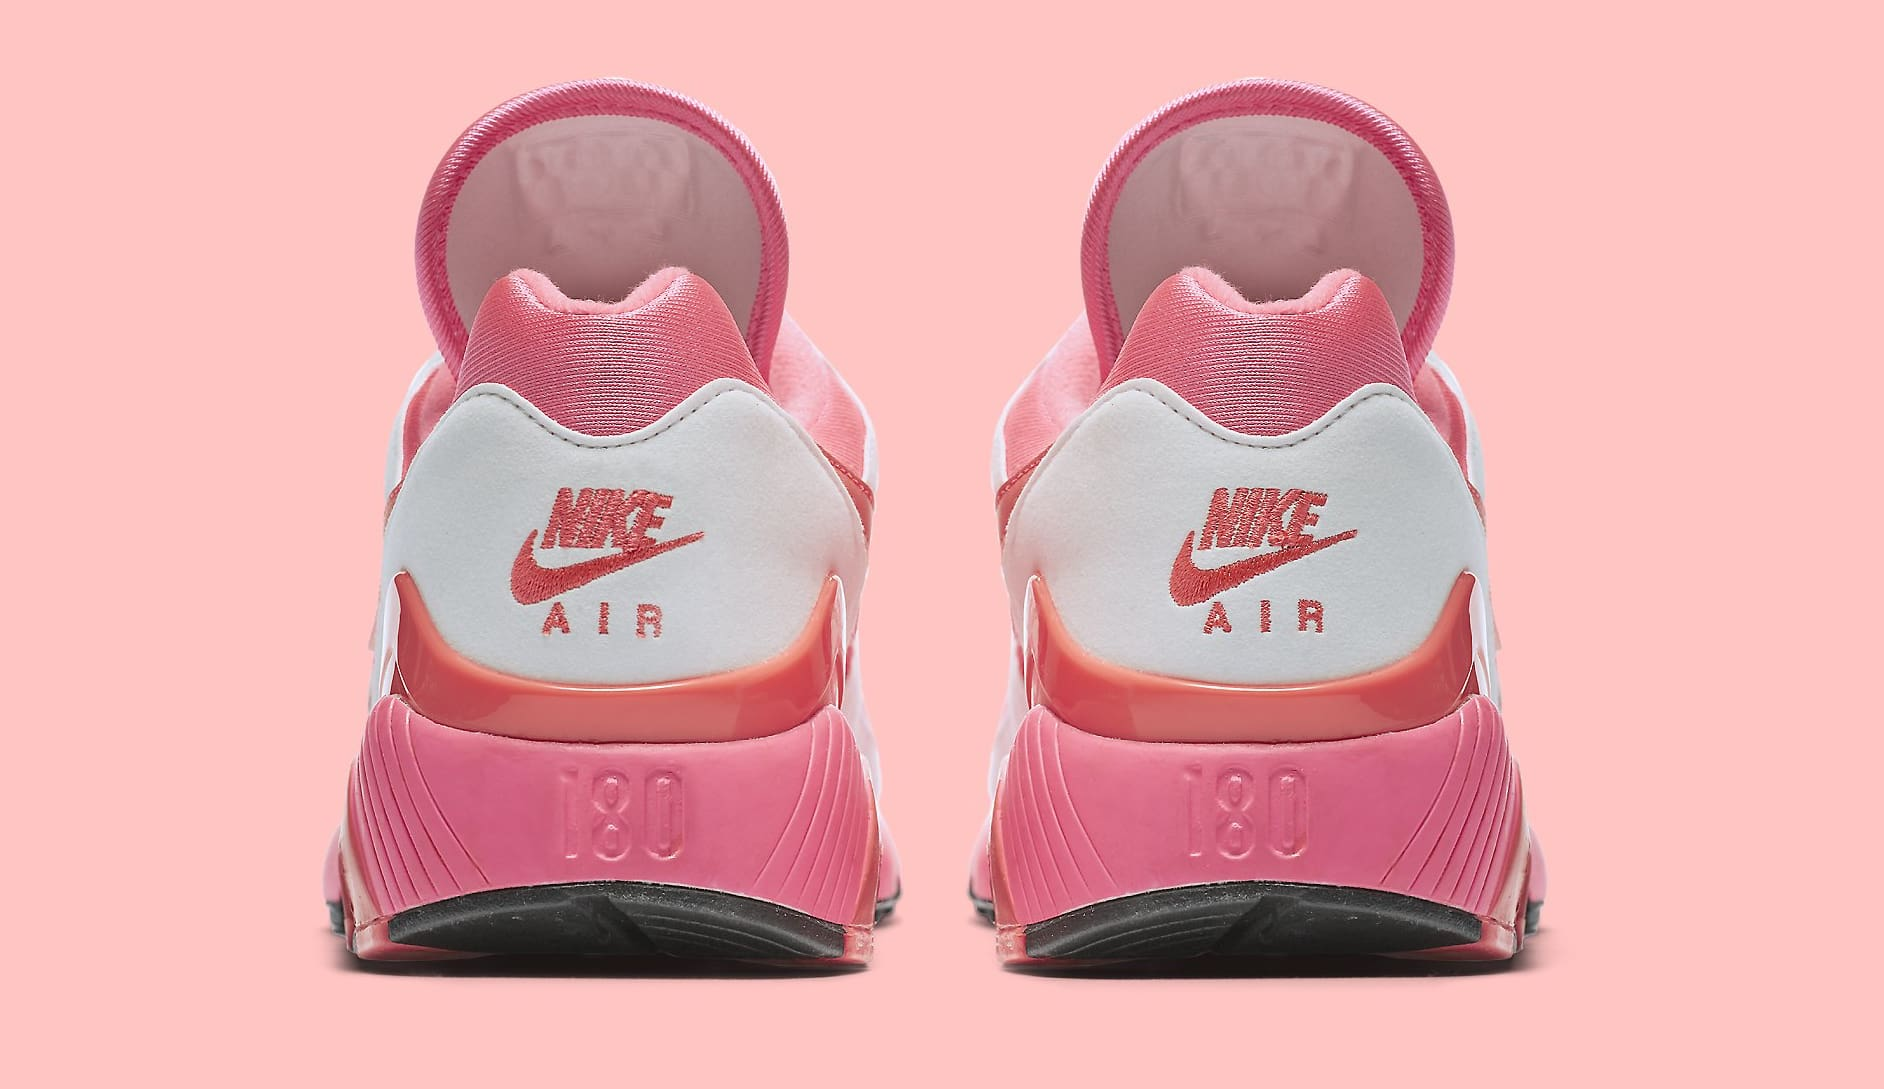 Sepatu Nike Air Max 180 x Comme des Garcons CDG 2018 - Pink White